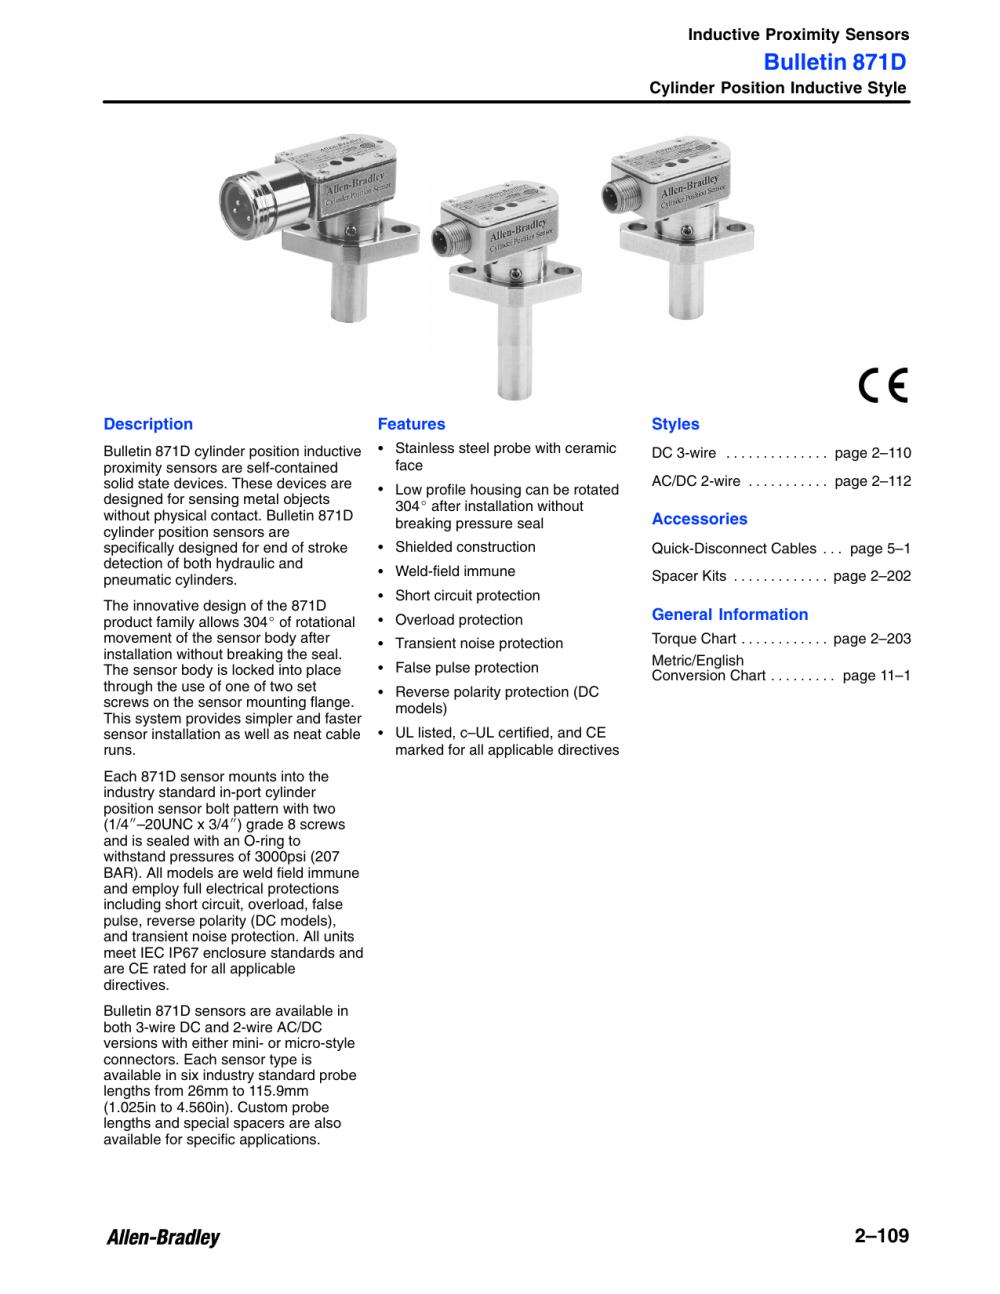 medium resolution of bulletin 871d inductive proximity sensors cylinder position inductive style description manualzz com